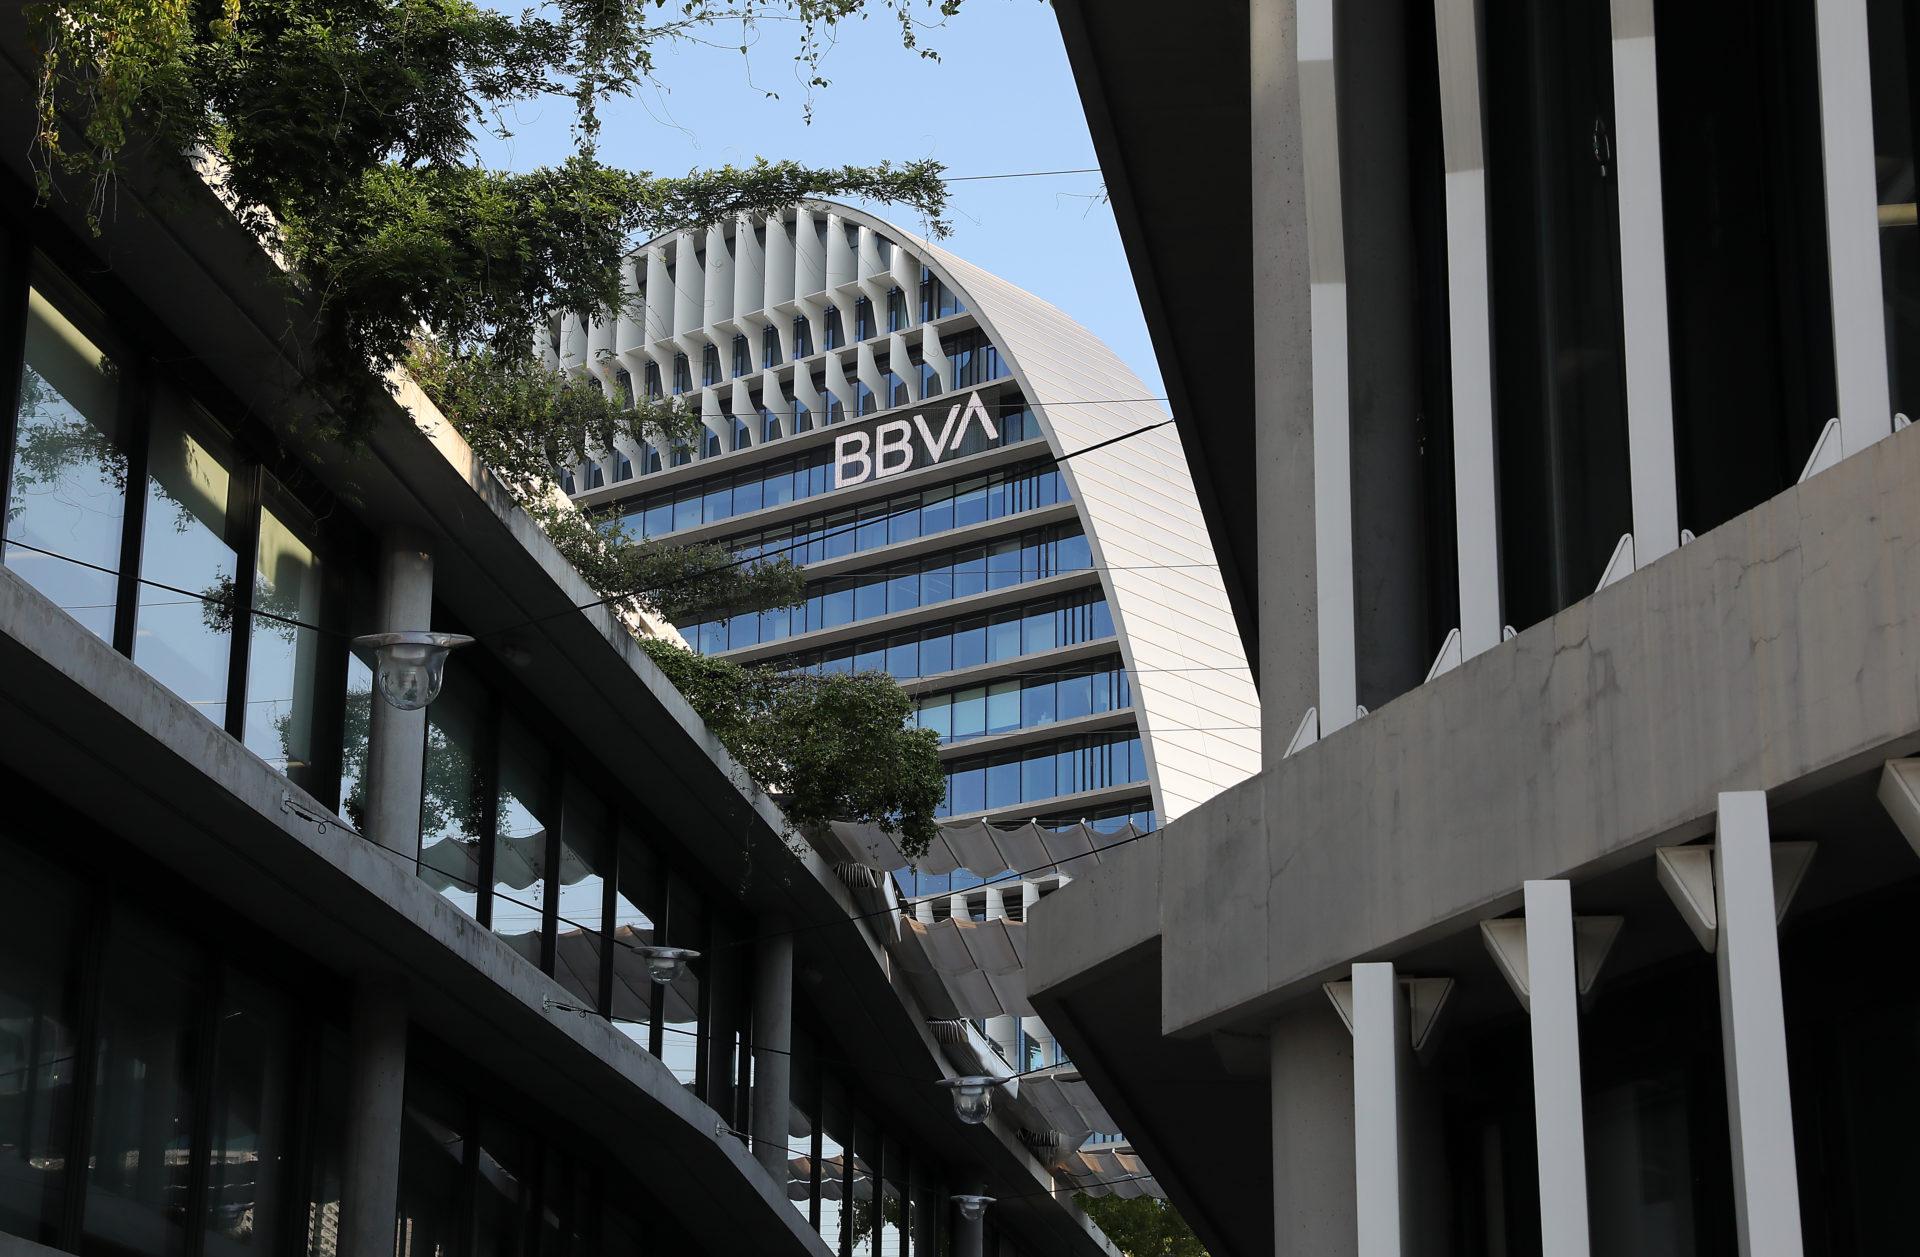 https://accionistaseinversores.bbva.com/wp-content/uploads/2020/01/ciudad-bbva-vela-logo-bbva-1920x1257.jpg